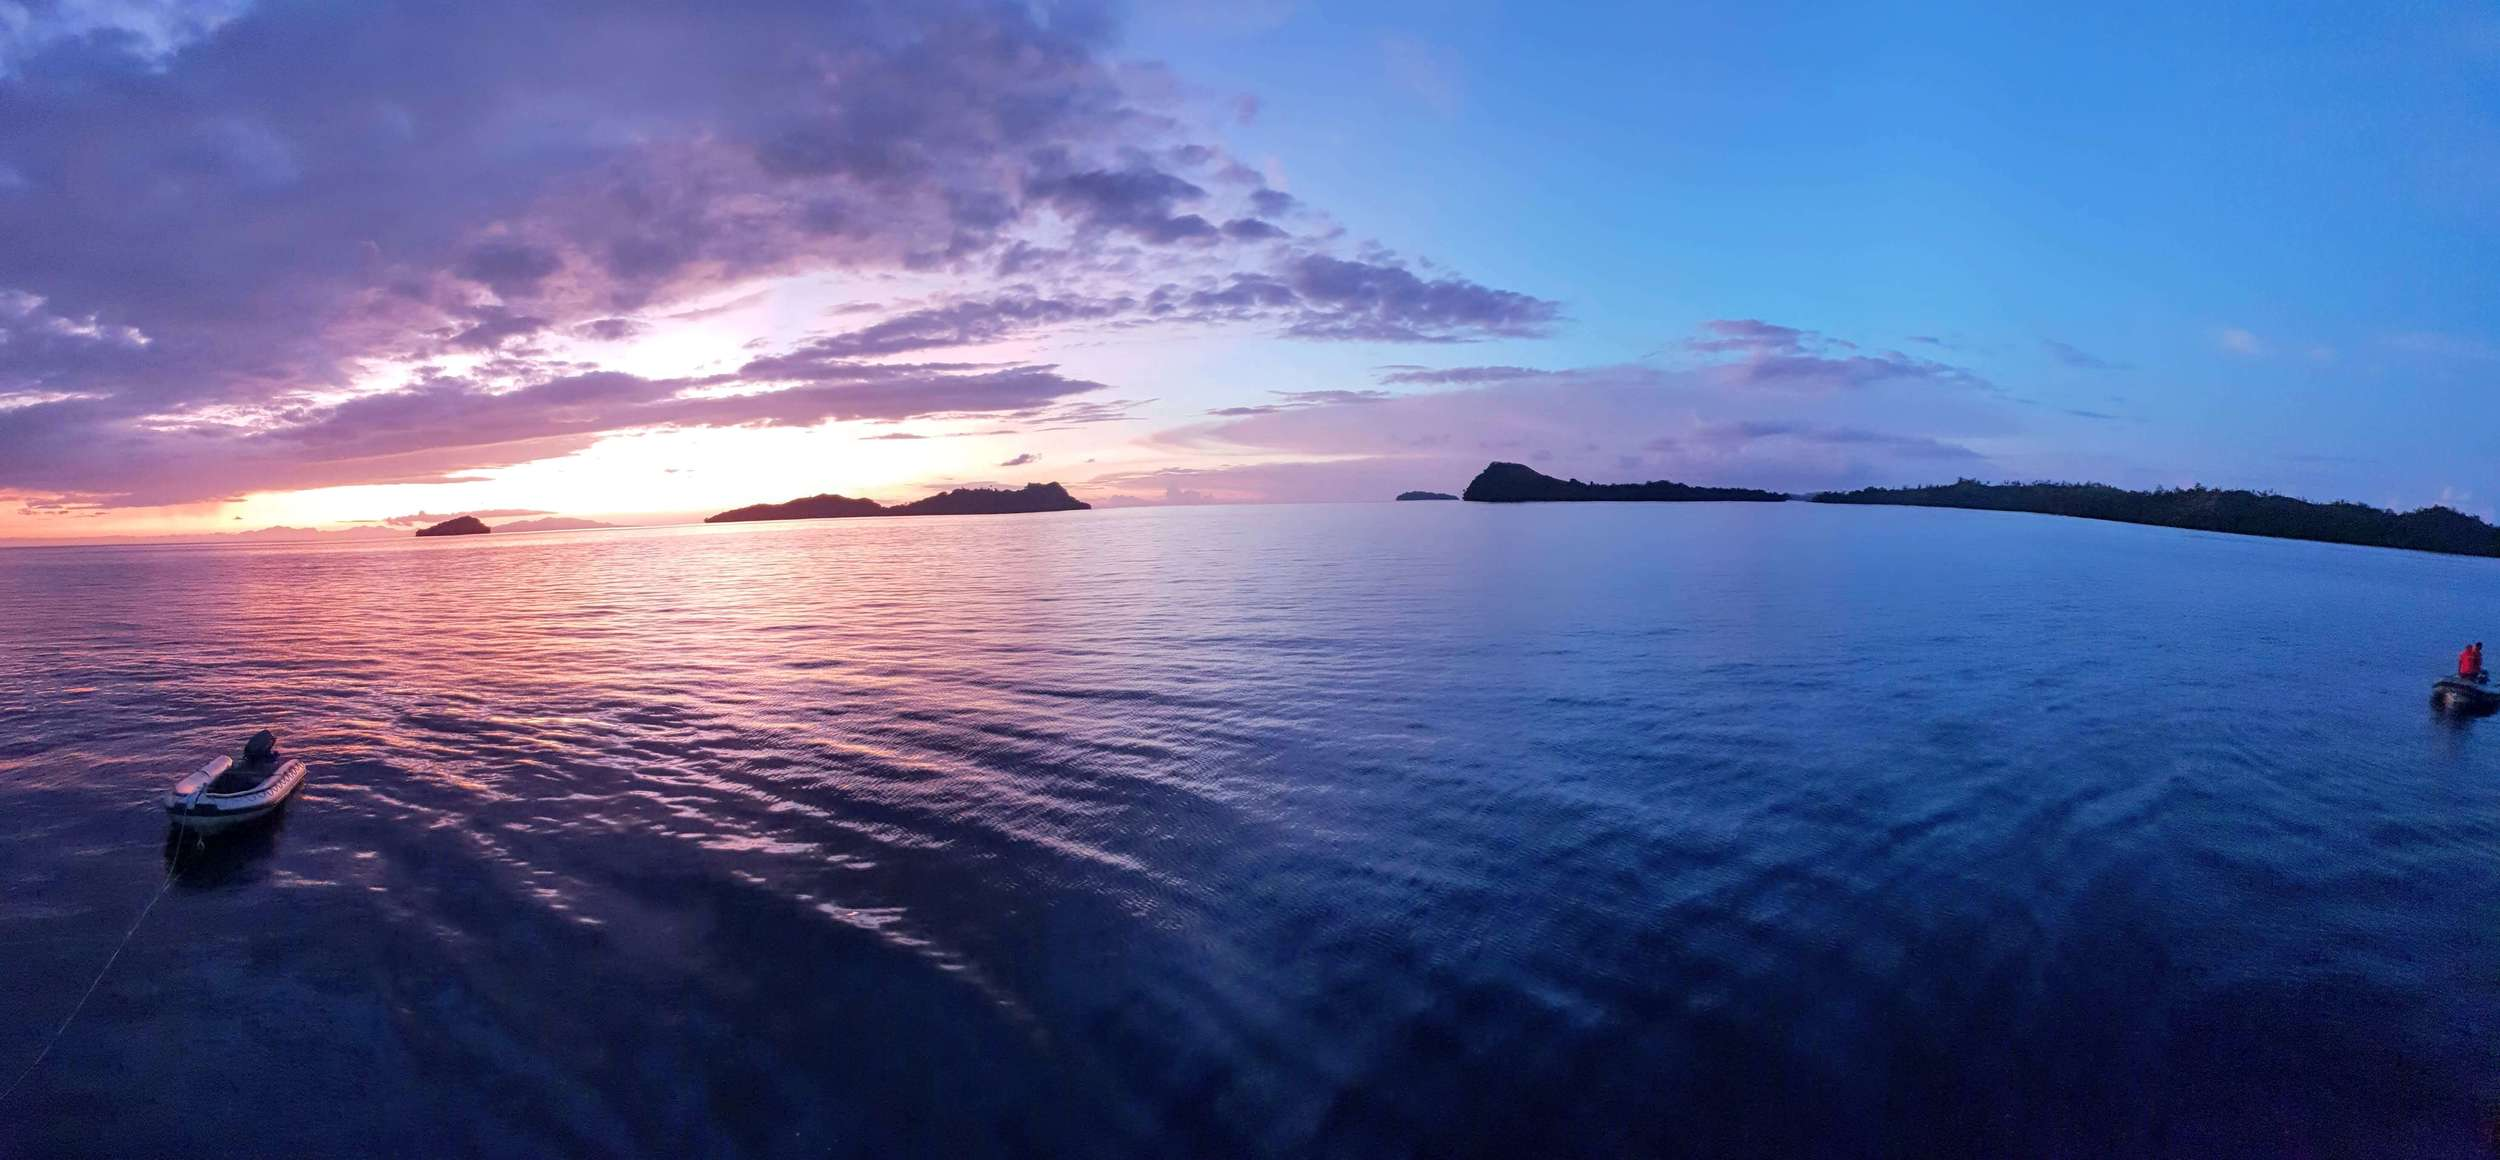 Sunset in the Solomon Islands